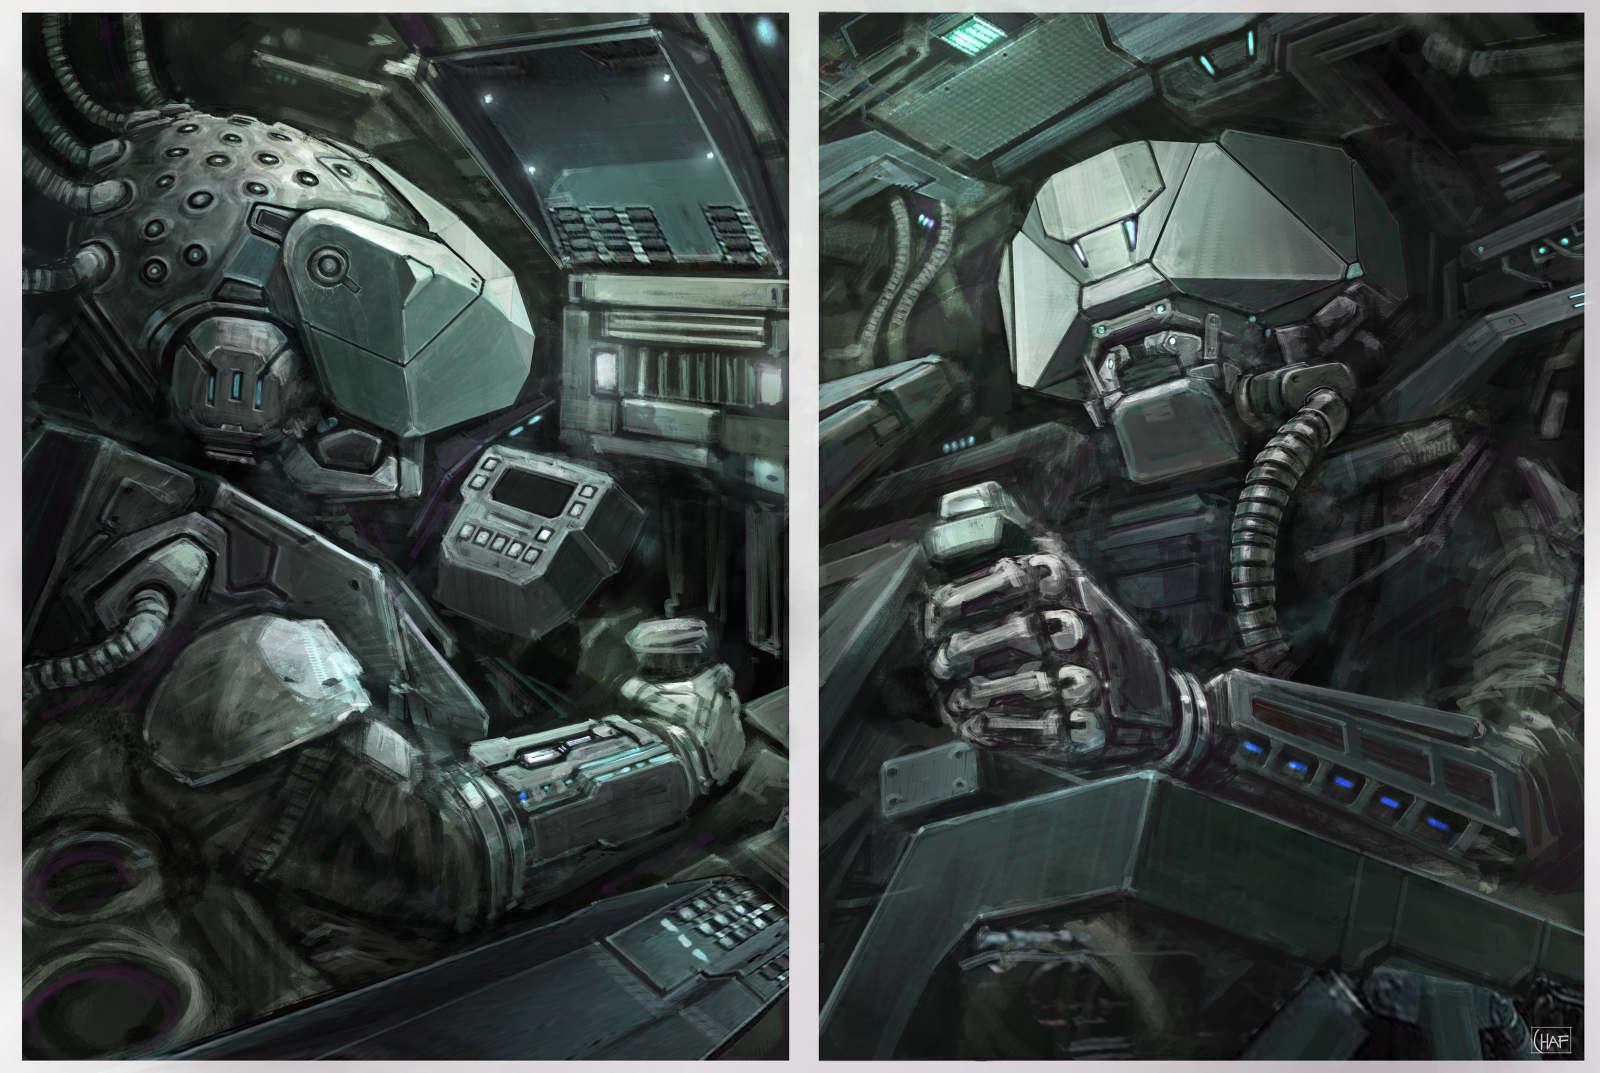 Sci Fi Console Concept Art